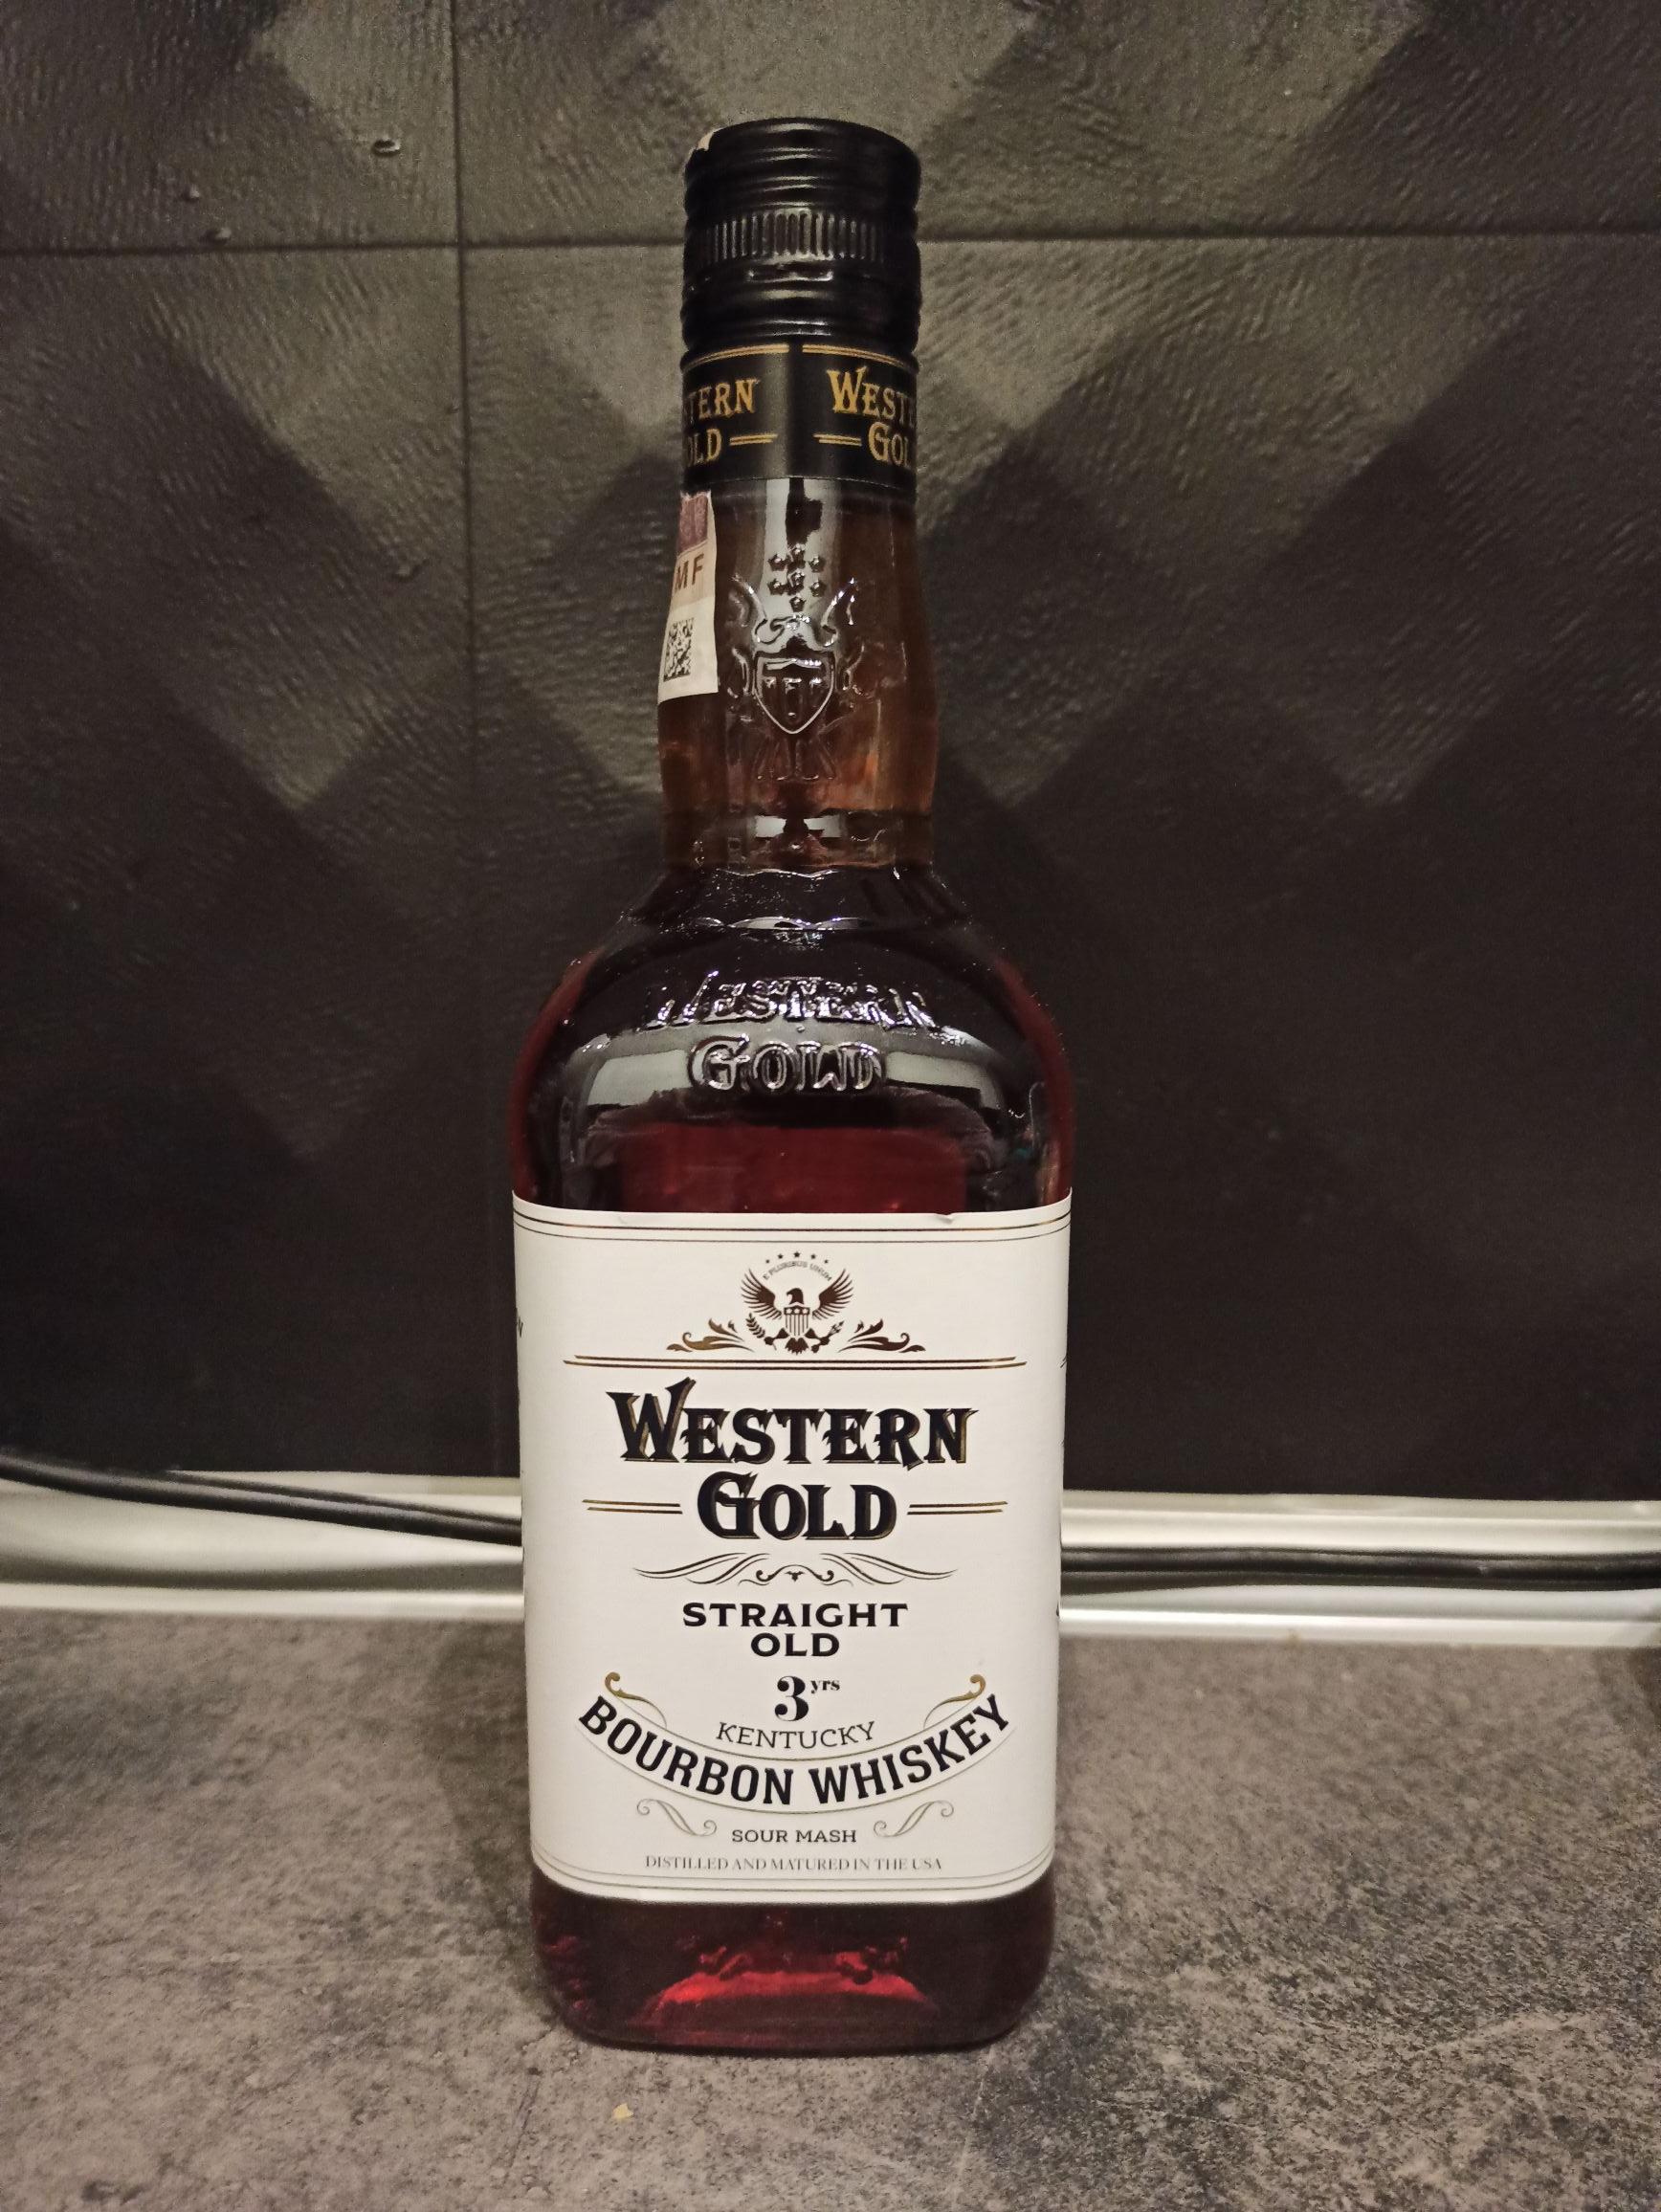 Western Gold Bourbon Whiskey 0,7 LIDL